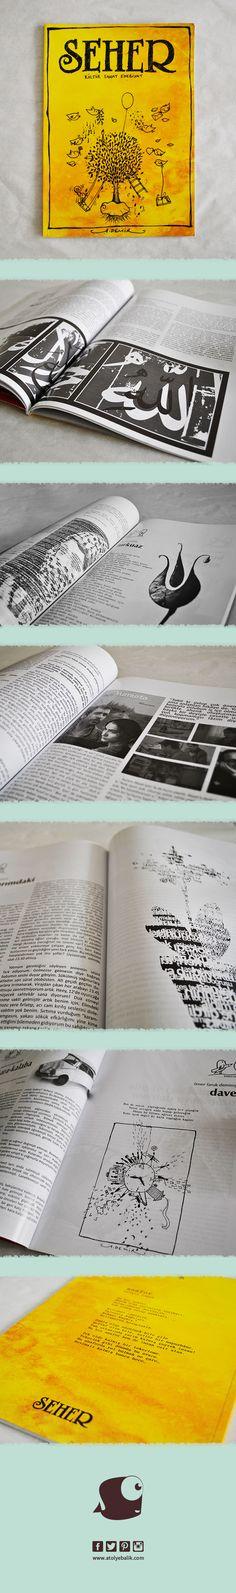 Seher Dergisi, tasarım: @rmystmz @rumejsa2  Çizim @mahmetdemir